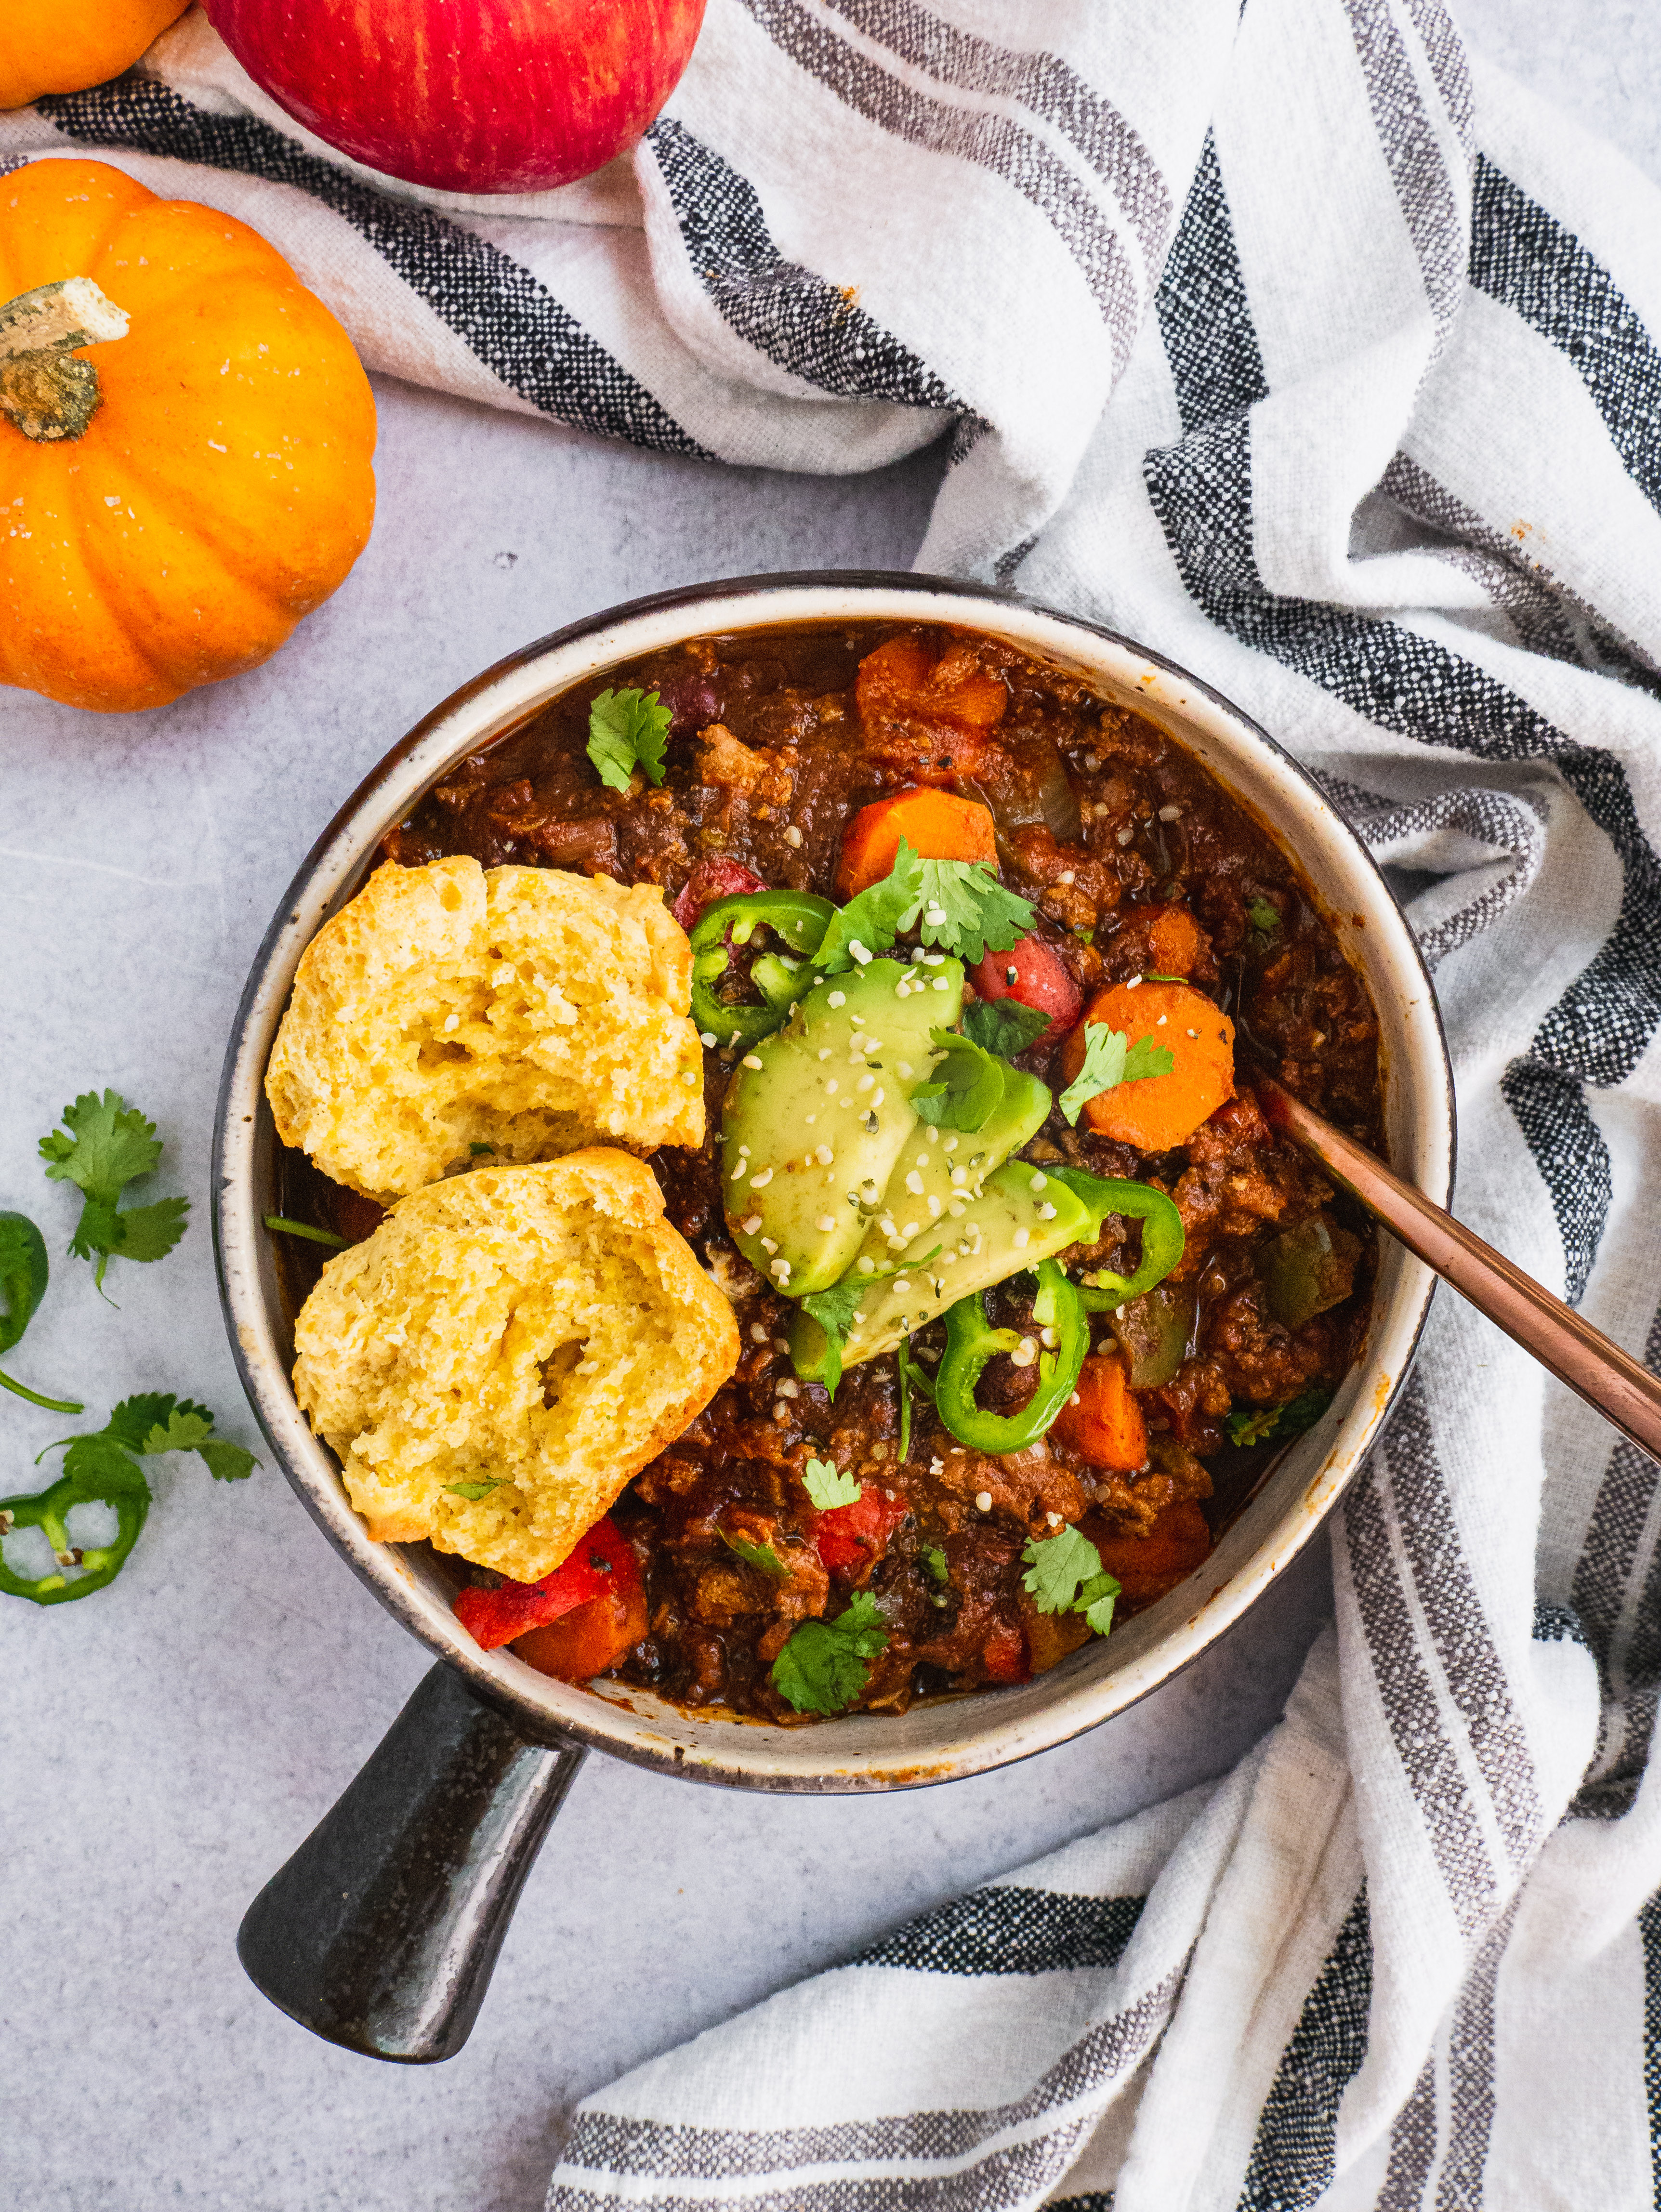 A serving pot with creamy pumpkin turkey chili. Topped with avocado, cilantro, avocado and one corn bread muffin split in half.